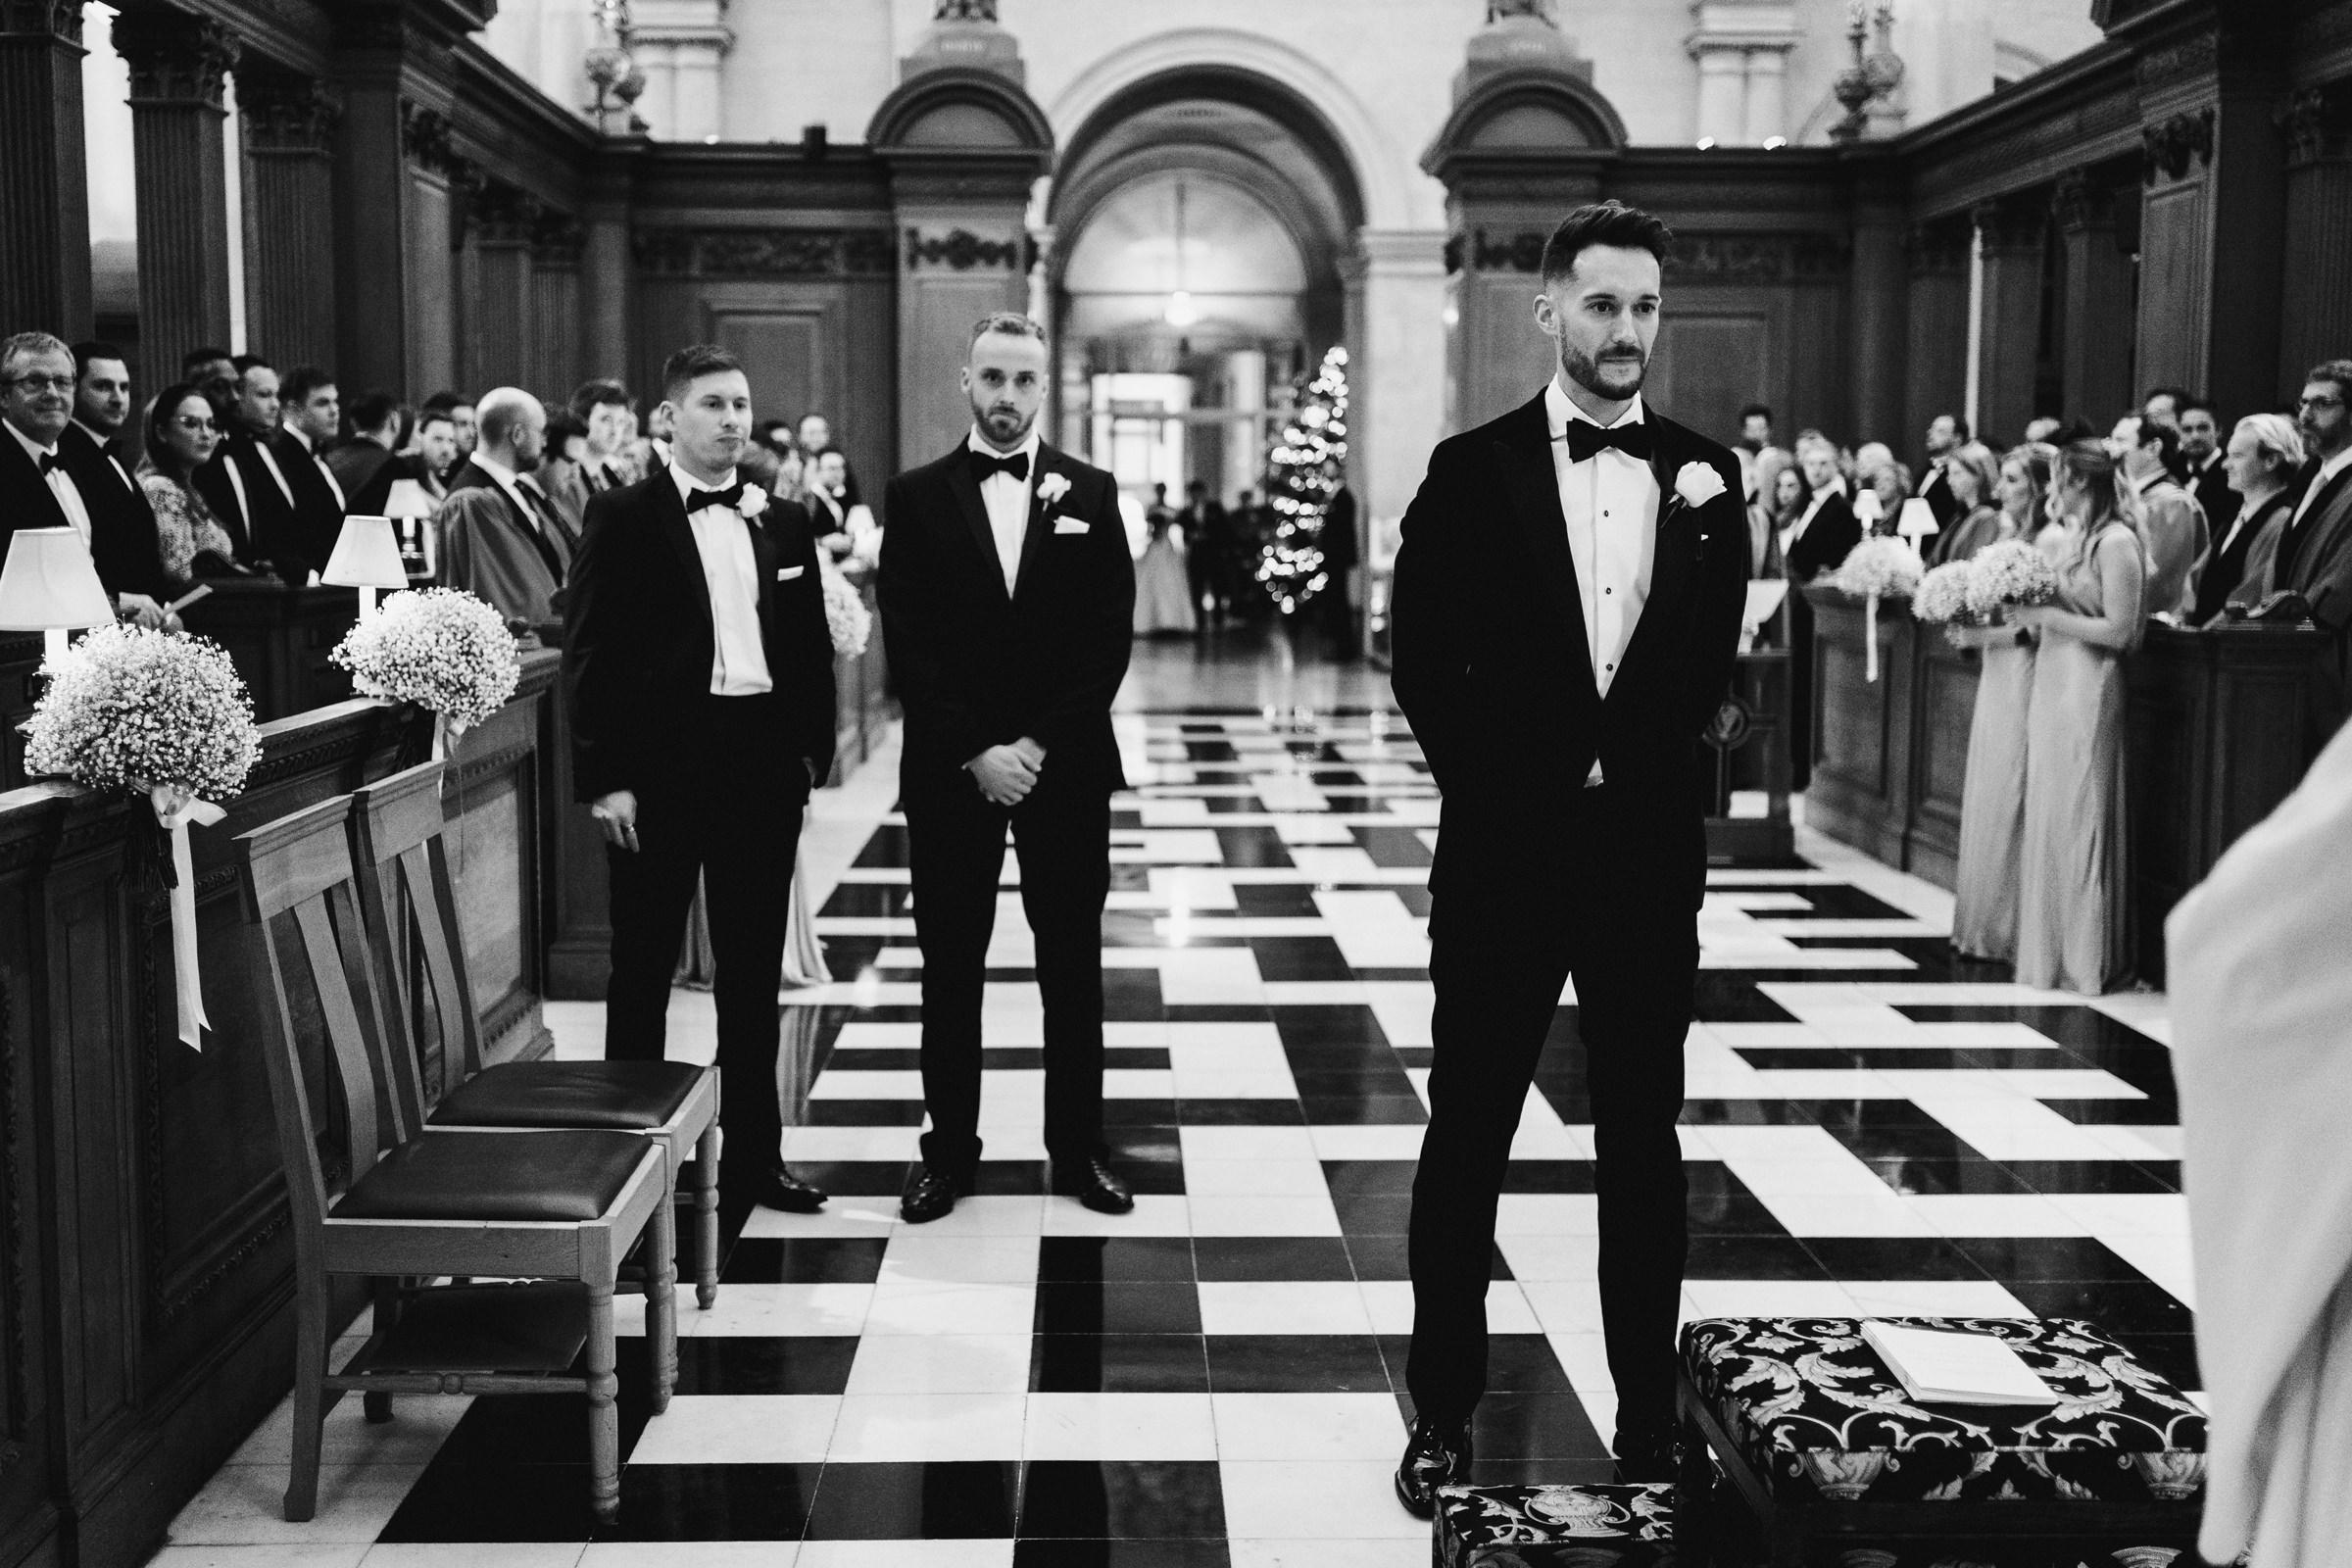 Groom awaits bride at altar - photo by MIKI Studios